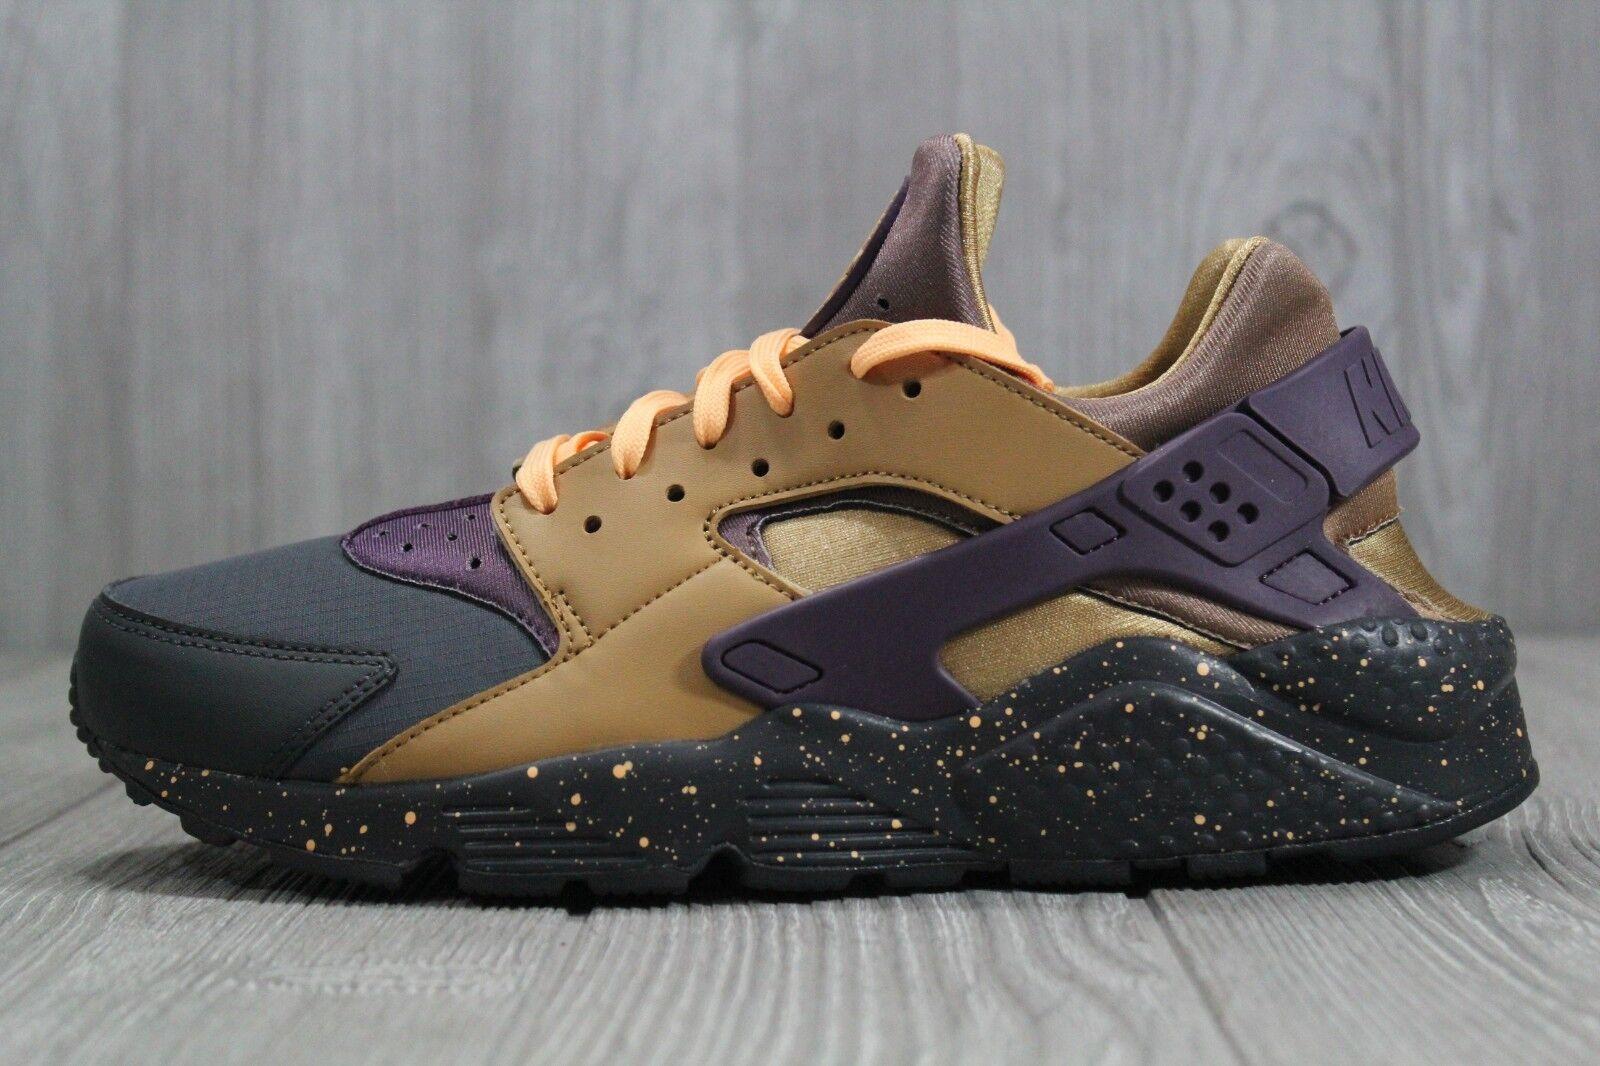 35 Mens Nike Air Huarache Run PRM PRM PRM Anthracite Purple gold shoes 704830 012 SZ 9.5 9e73fb